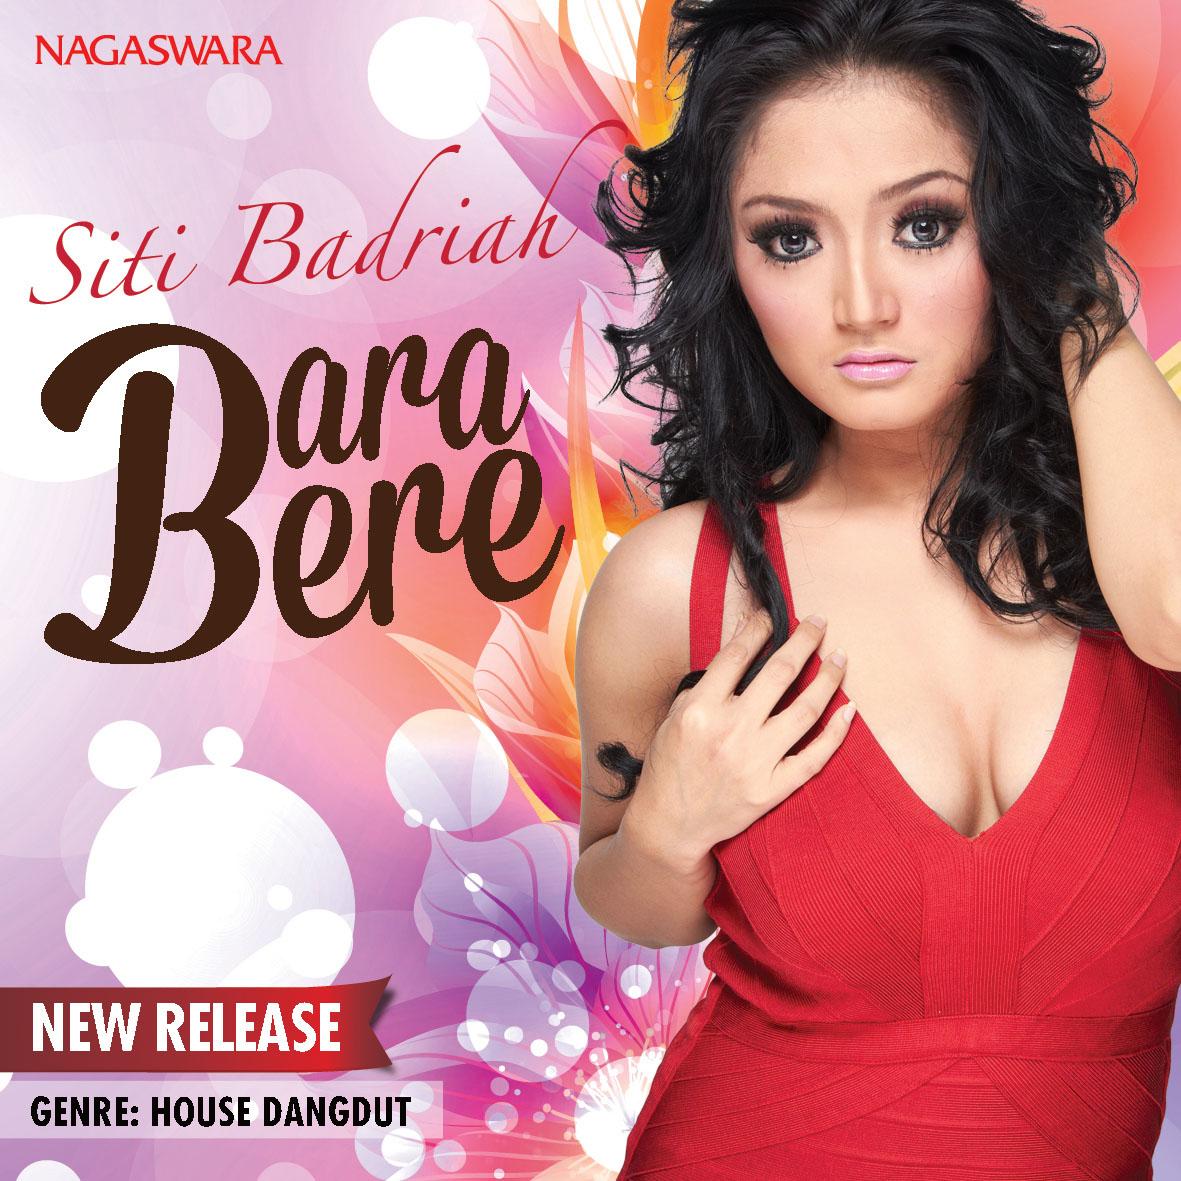 BARA BERE oleh Siti Badriah MP3 Lagu Gratis Album House Dangdut